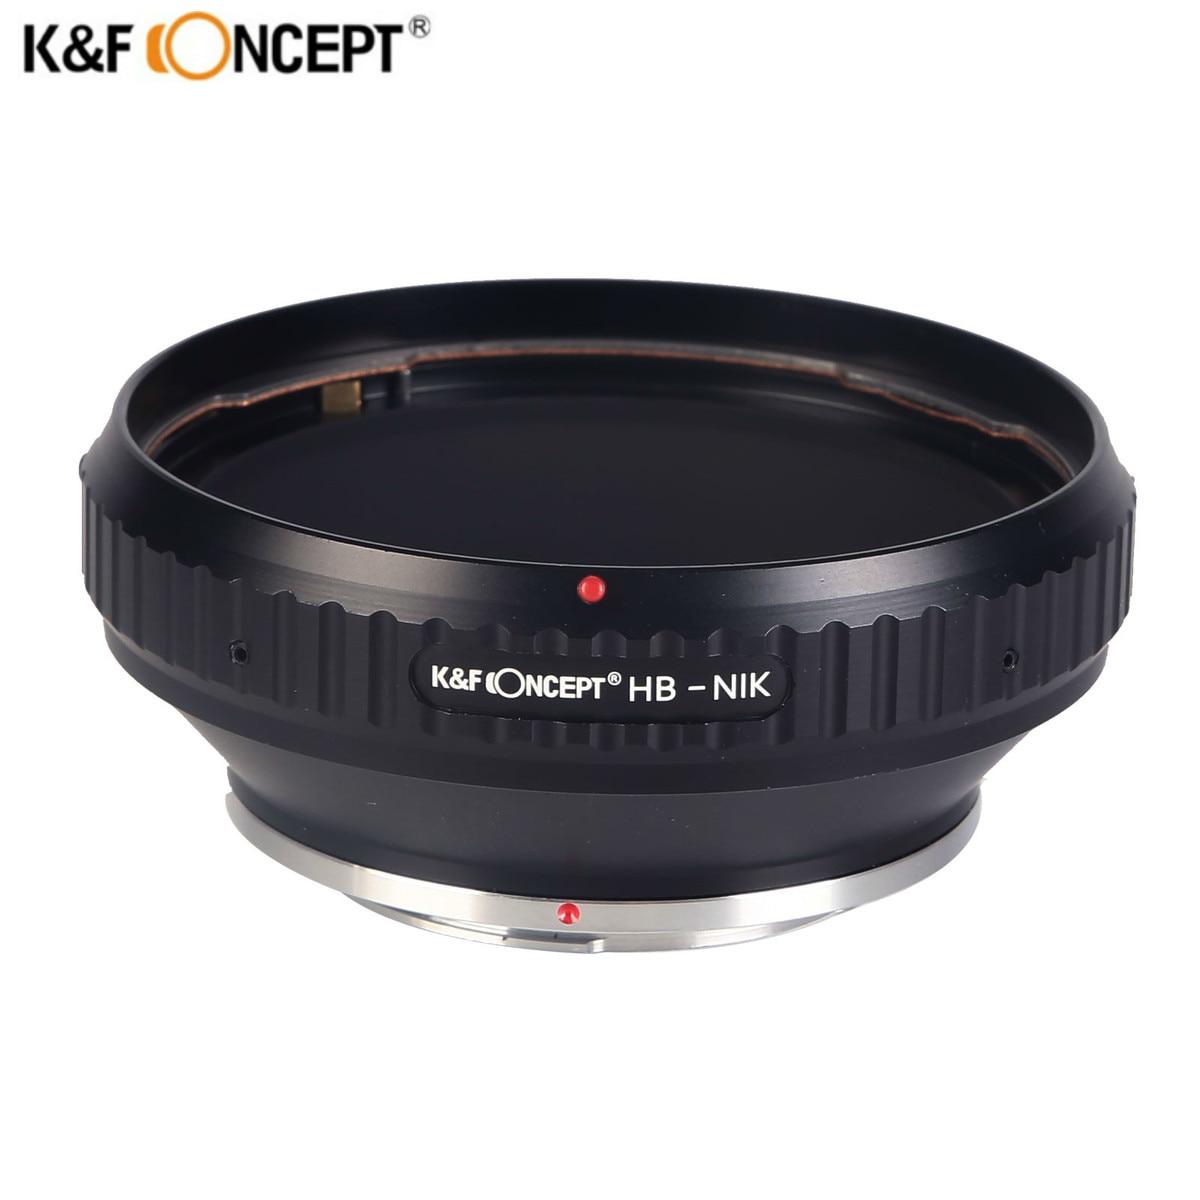 Переходное кольцо Адаптер для объектива Hasselblad V CF на Nikon F Mount Adapter D600 D800 D5200 D7100 фотоаппарата переходник HB-AI